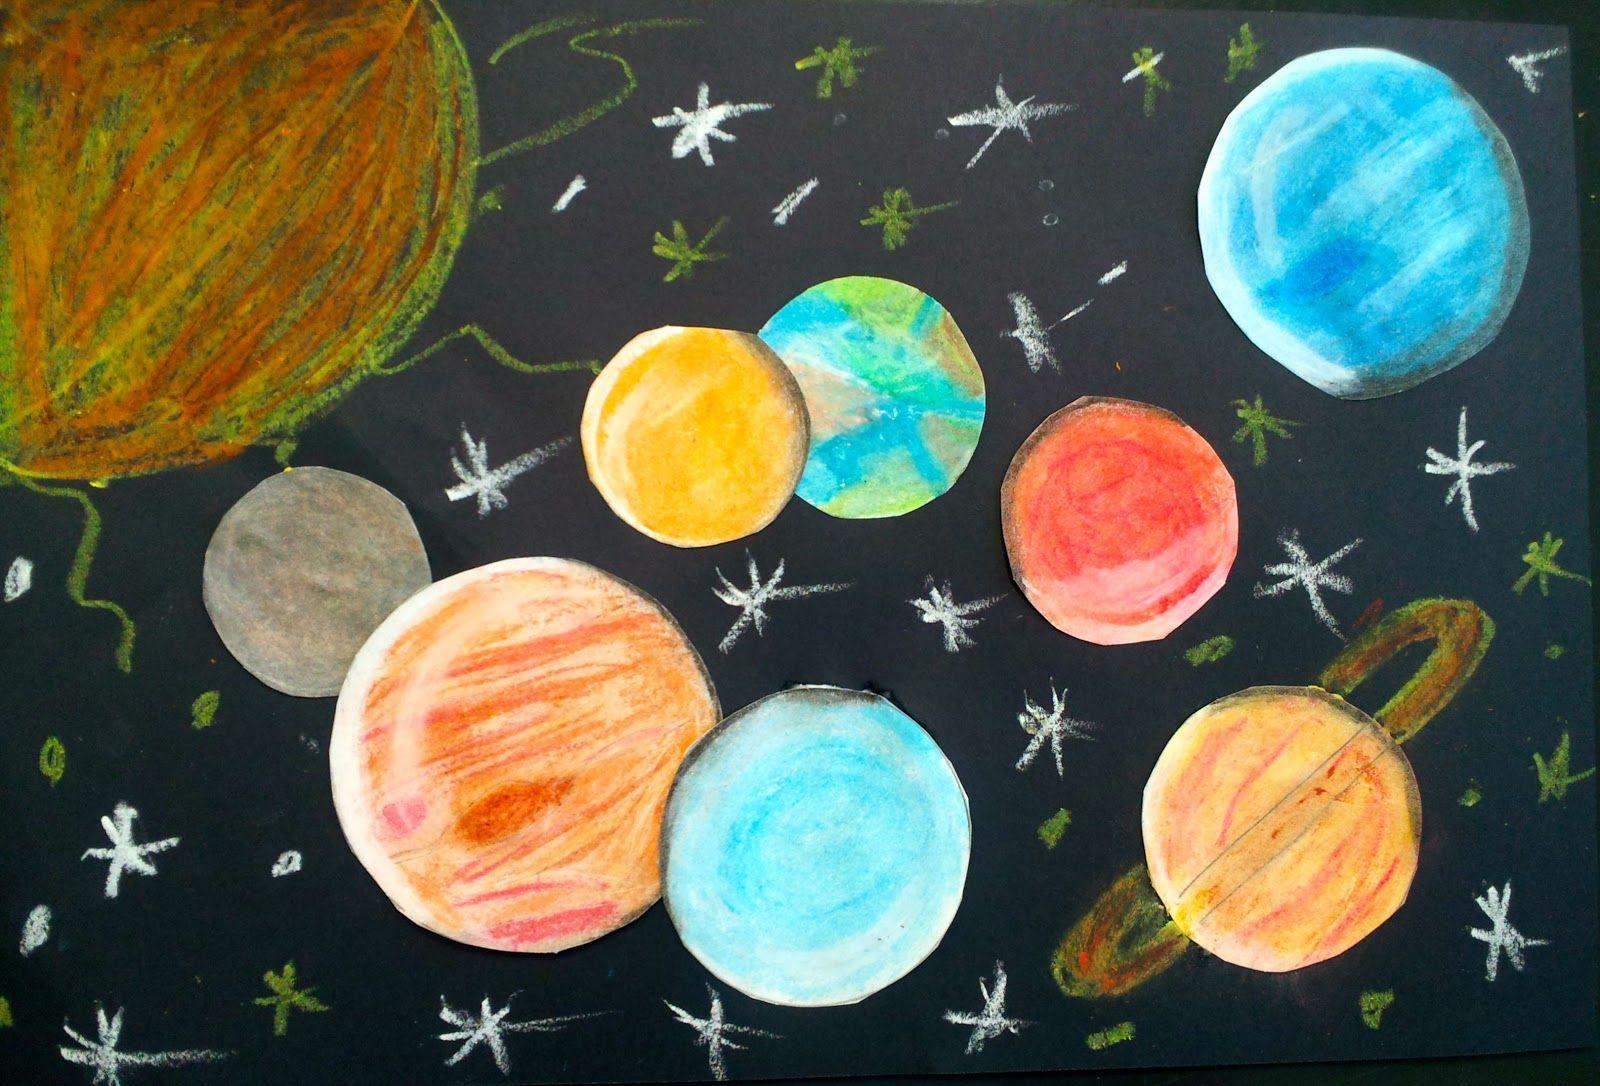 solar system use - photo #15